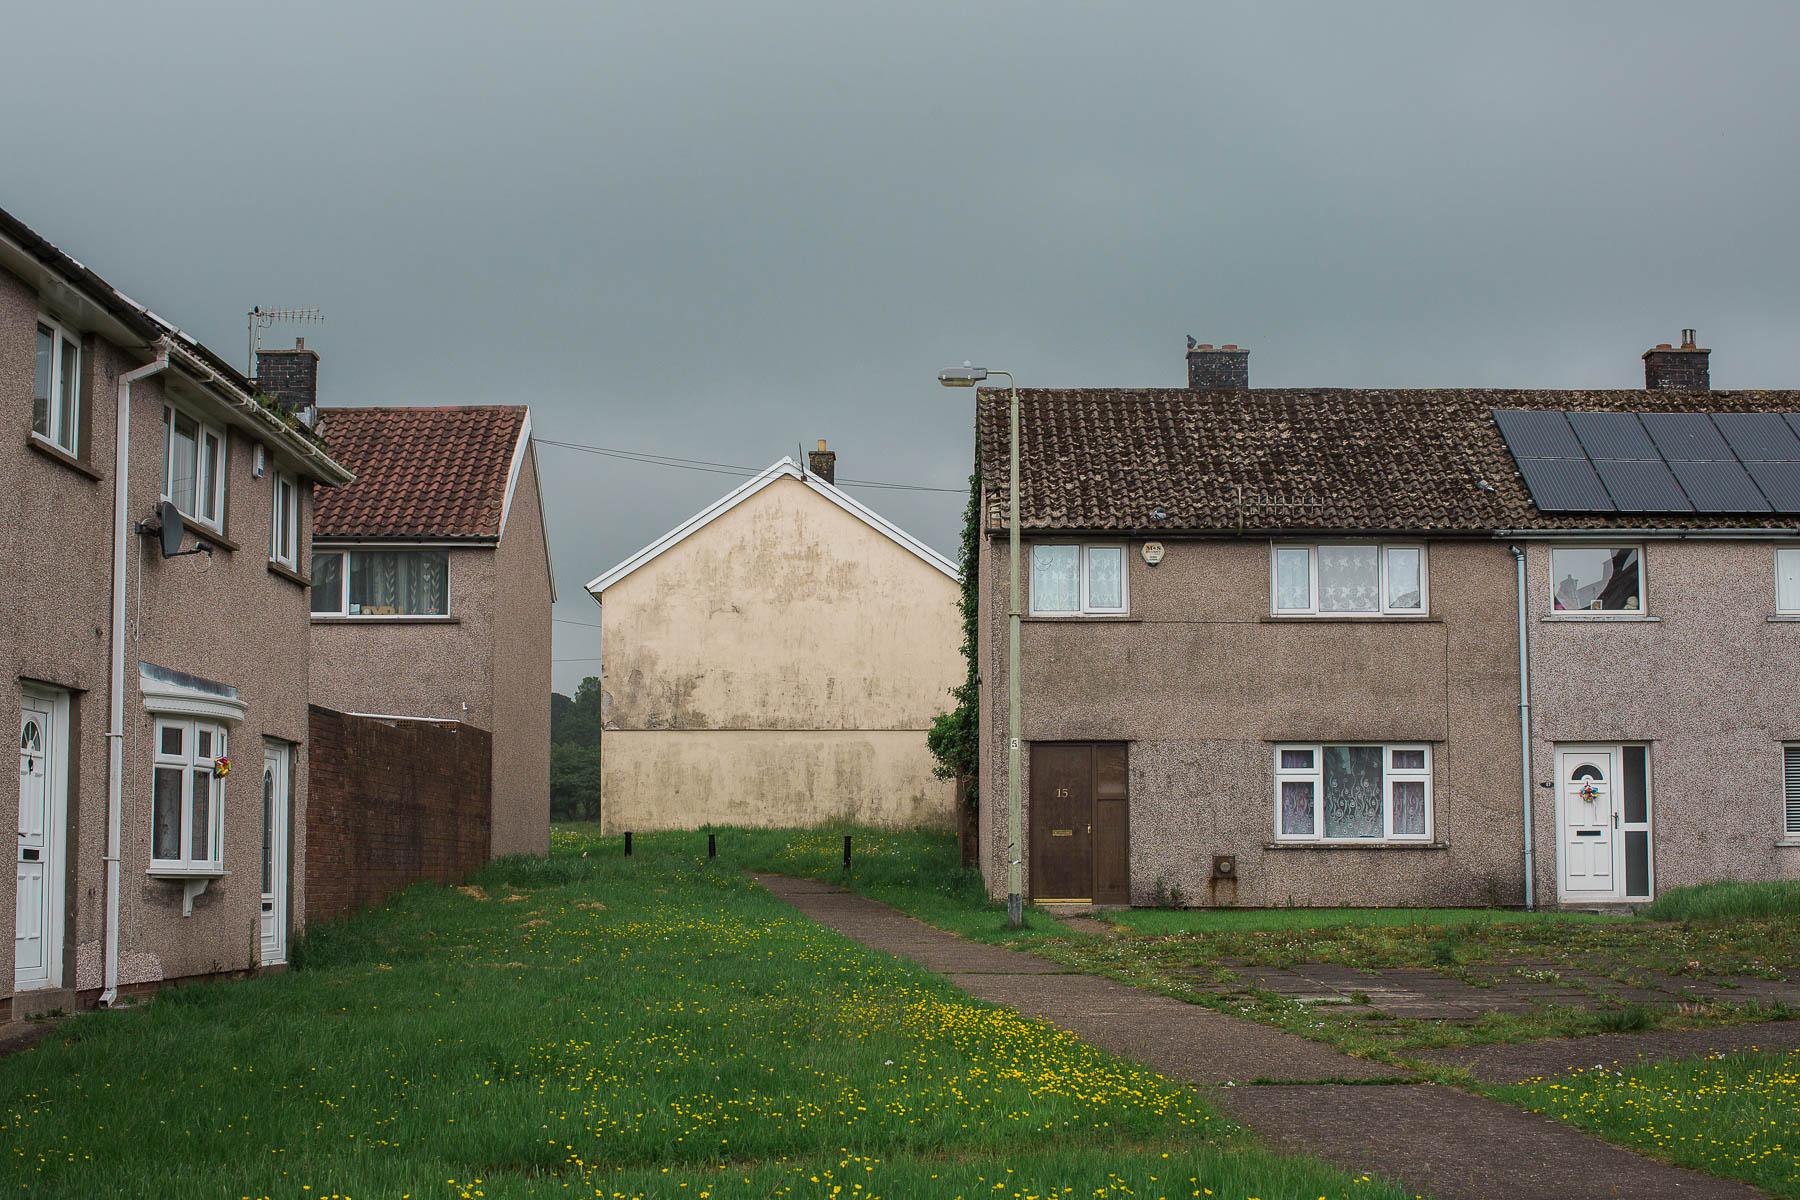 Gurnos housing estate,Merthyr Tydfil - a town dubbed 'sick note city' in the press.